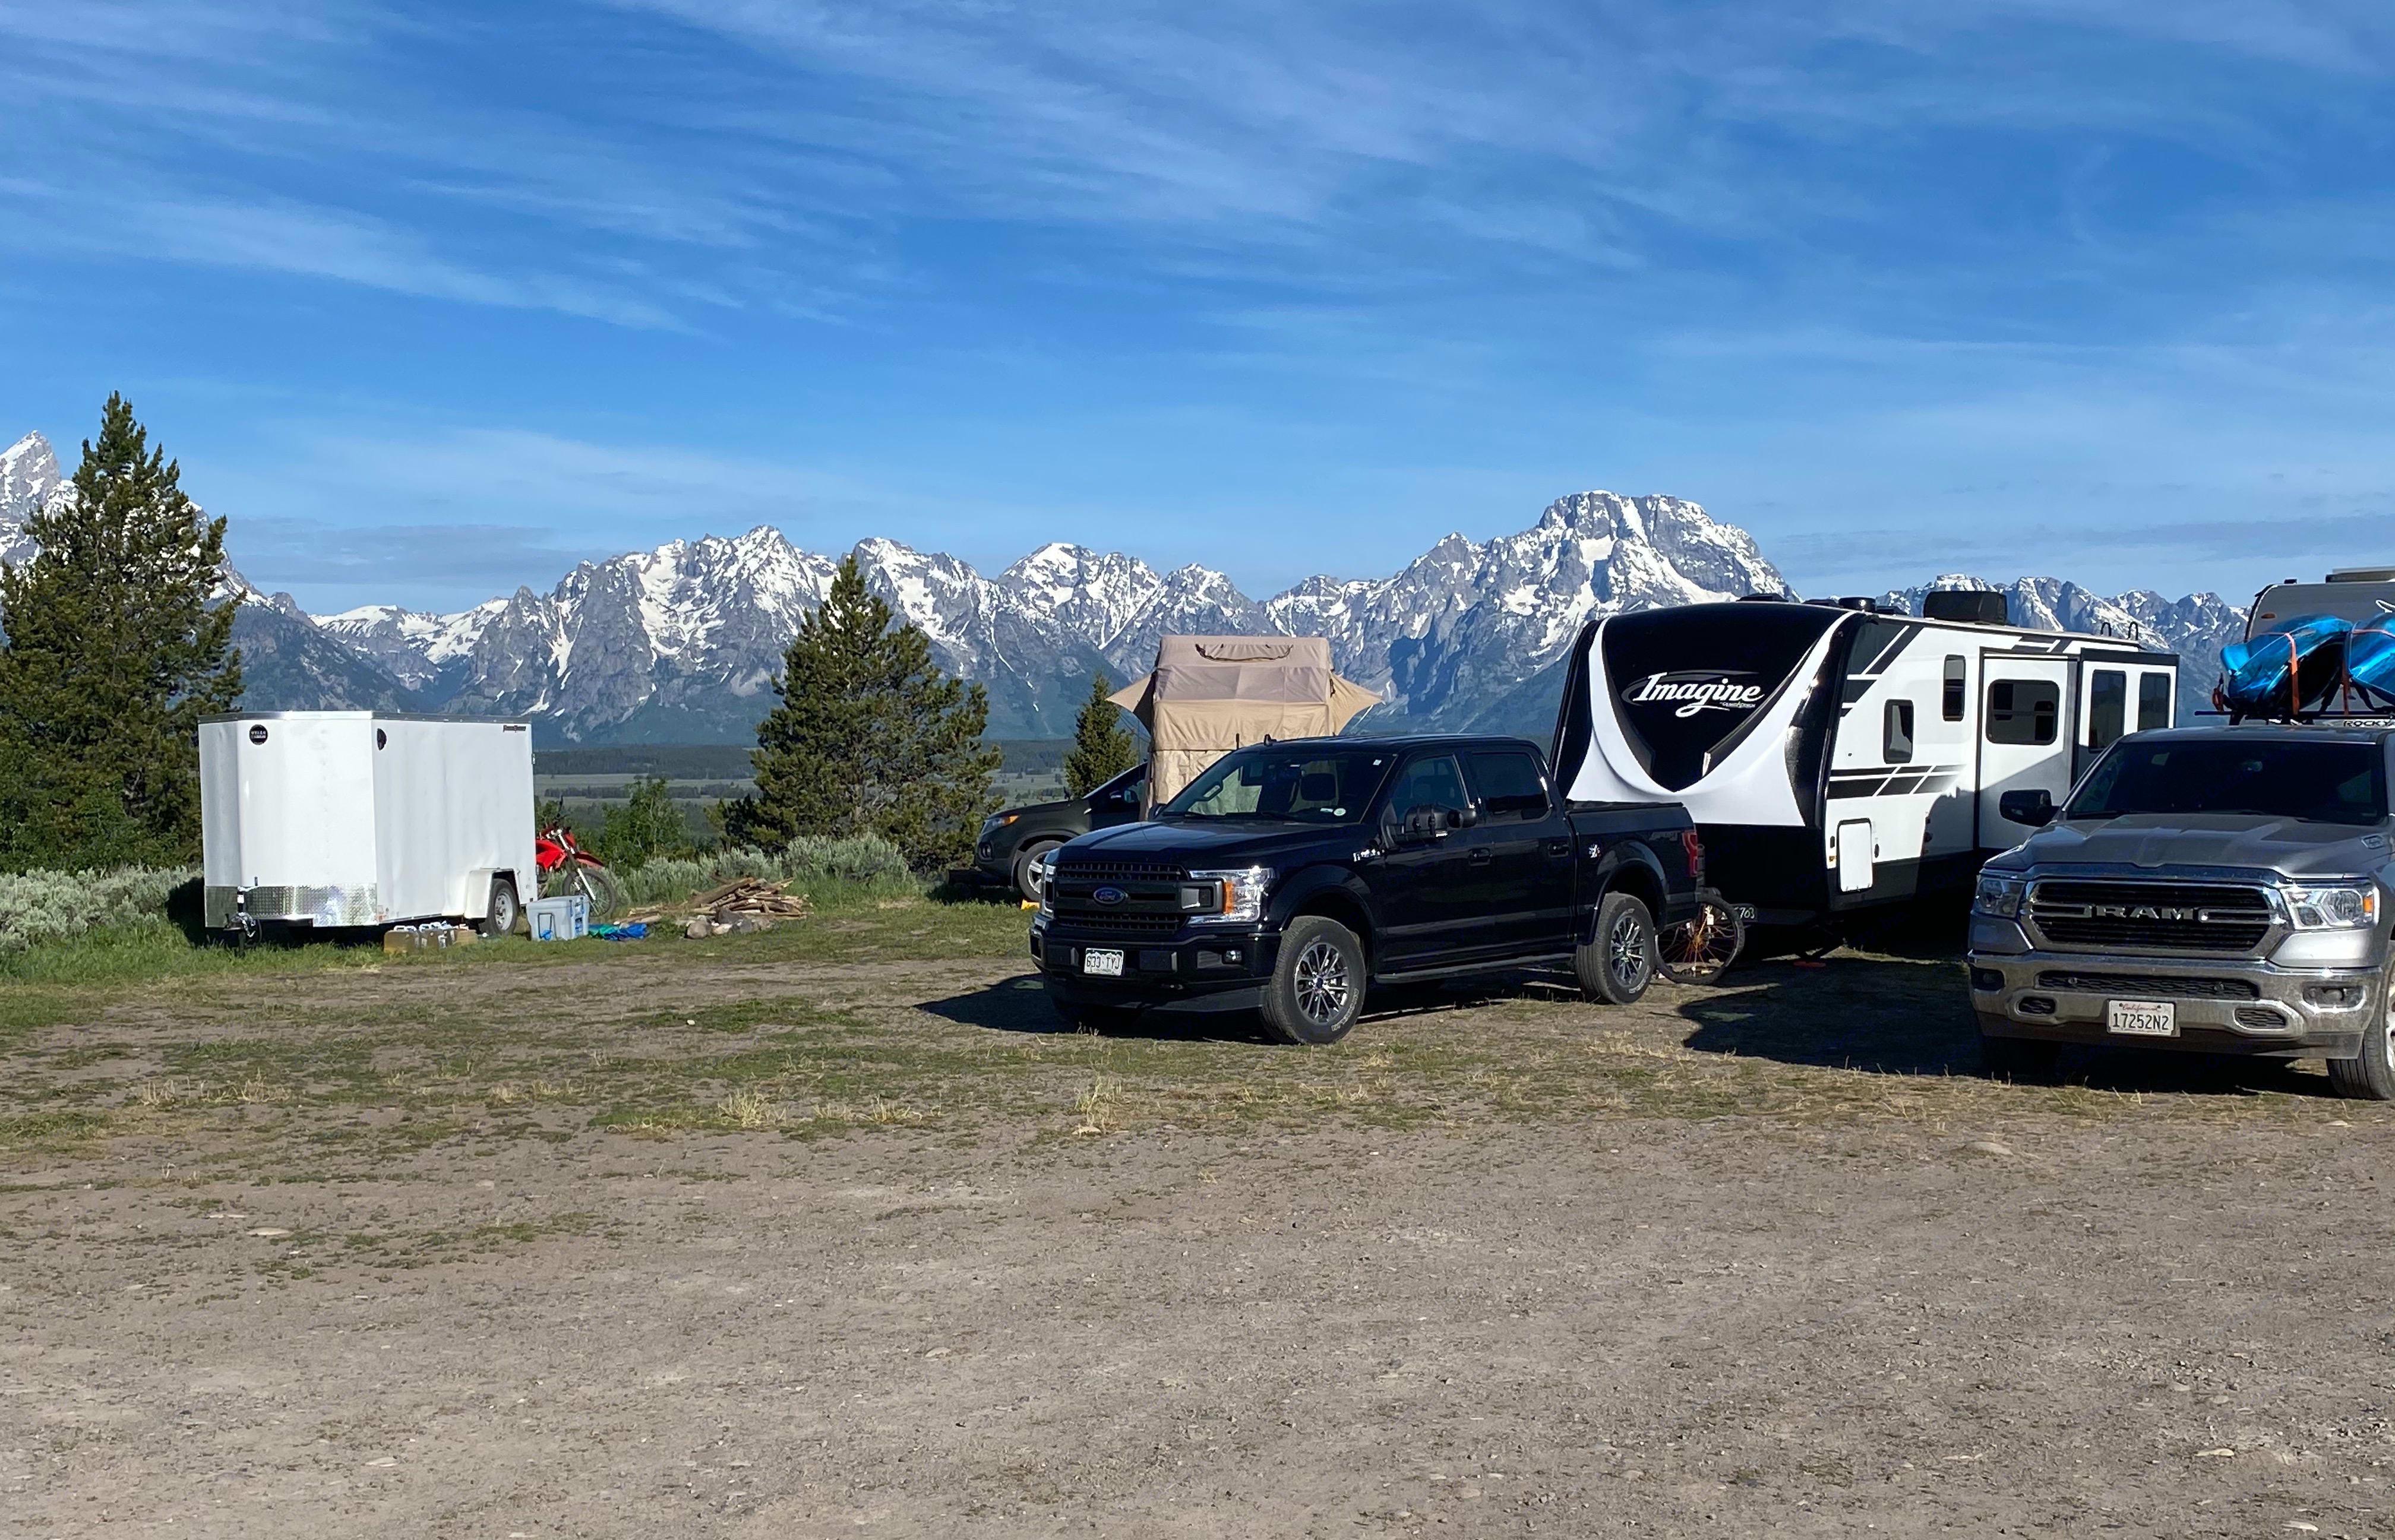 Dispersed camping at the Grand Tetons. Grand Design Imagine 2019